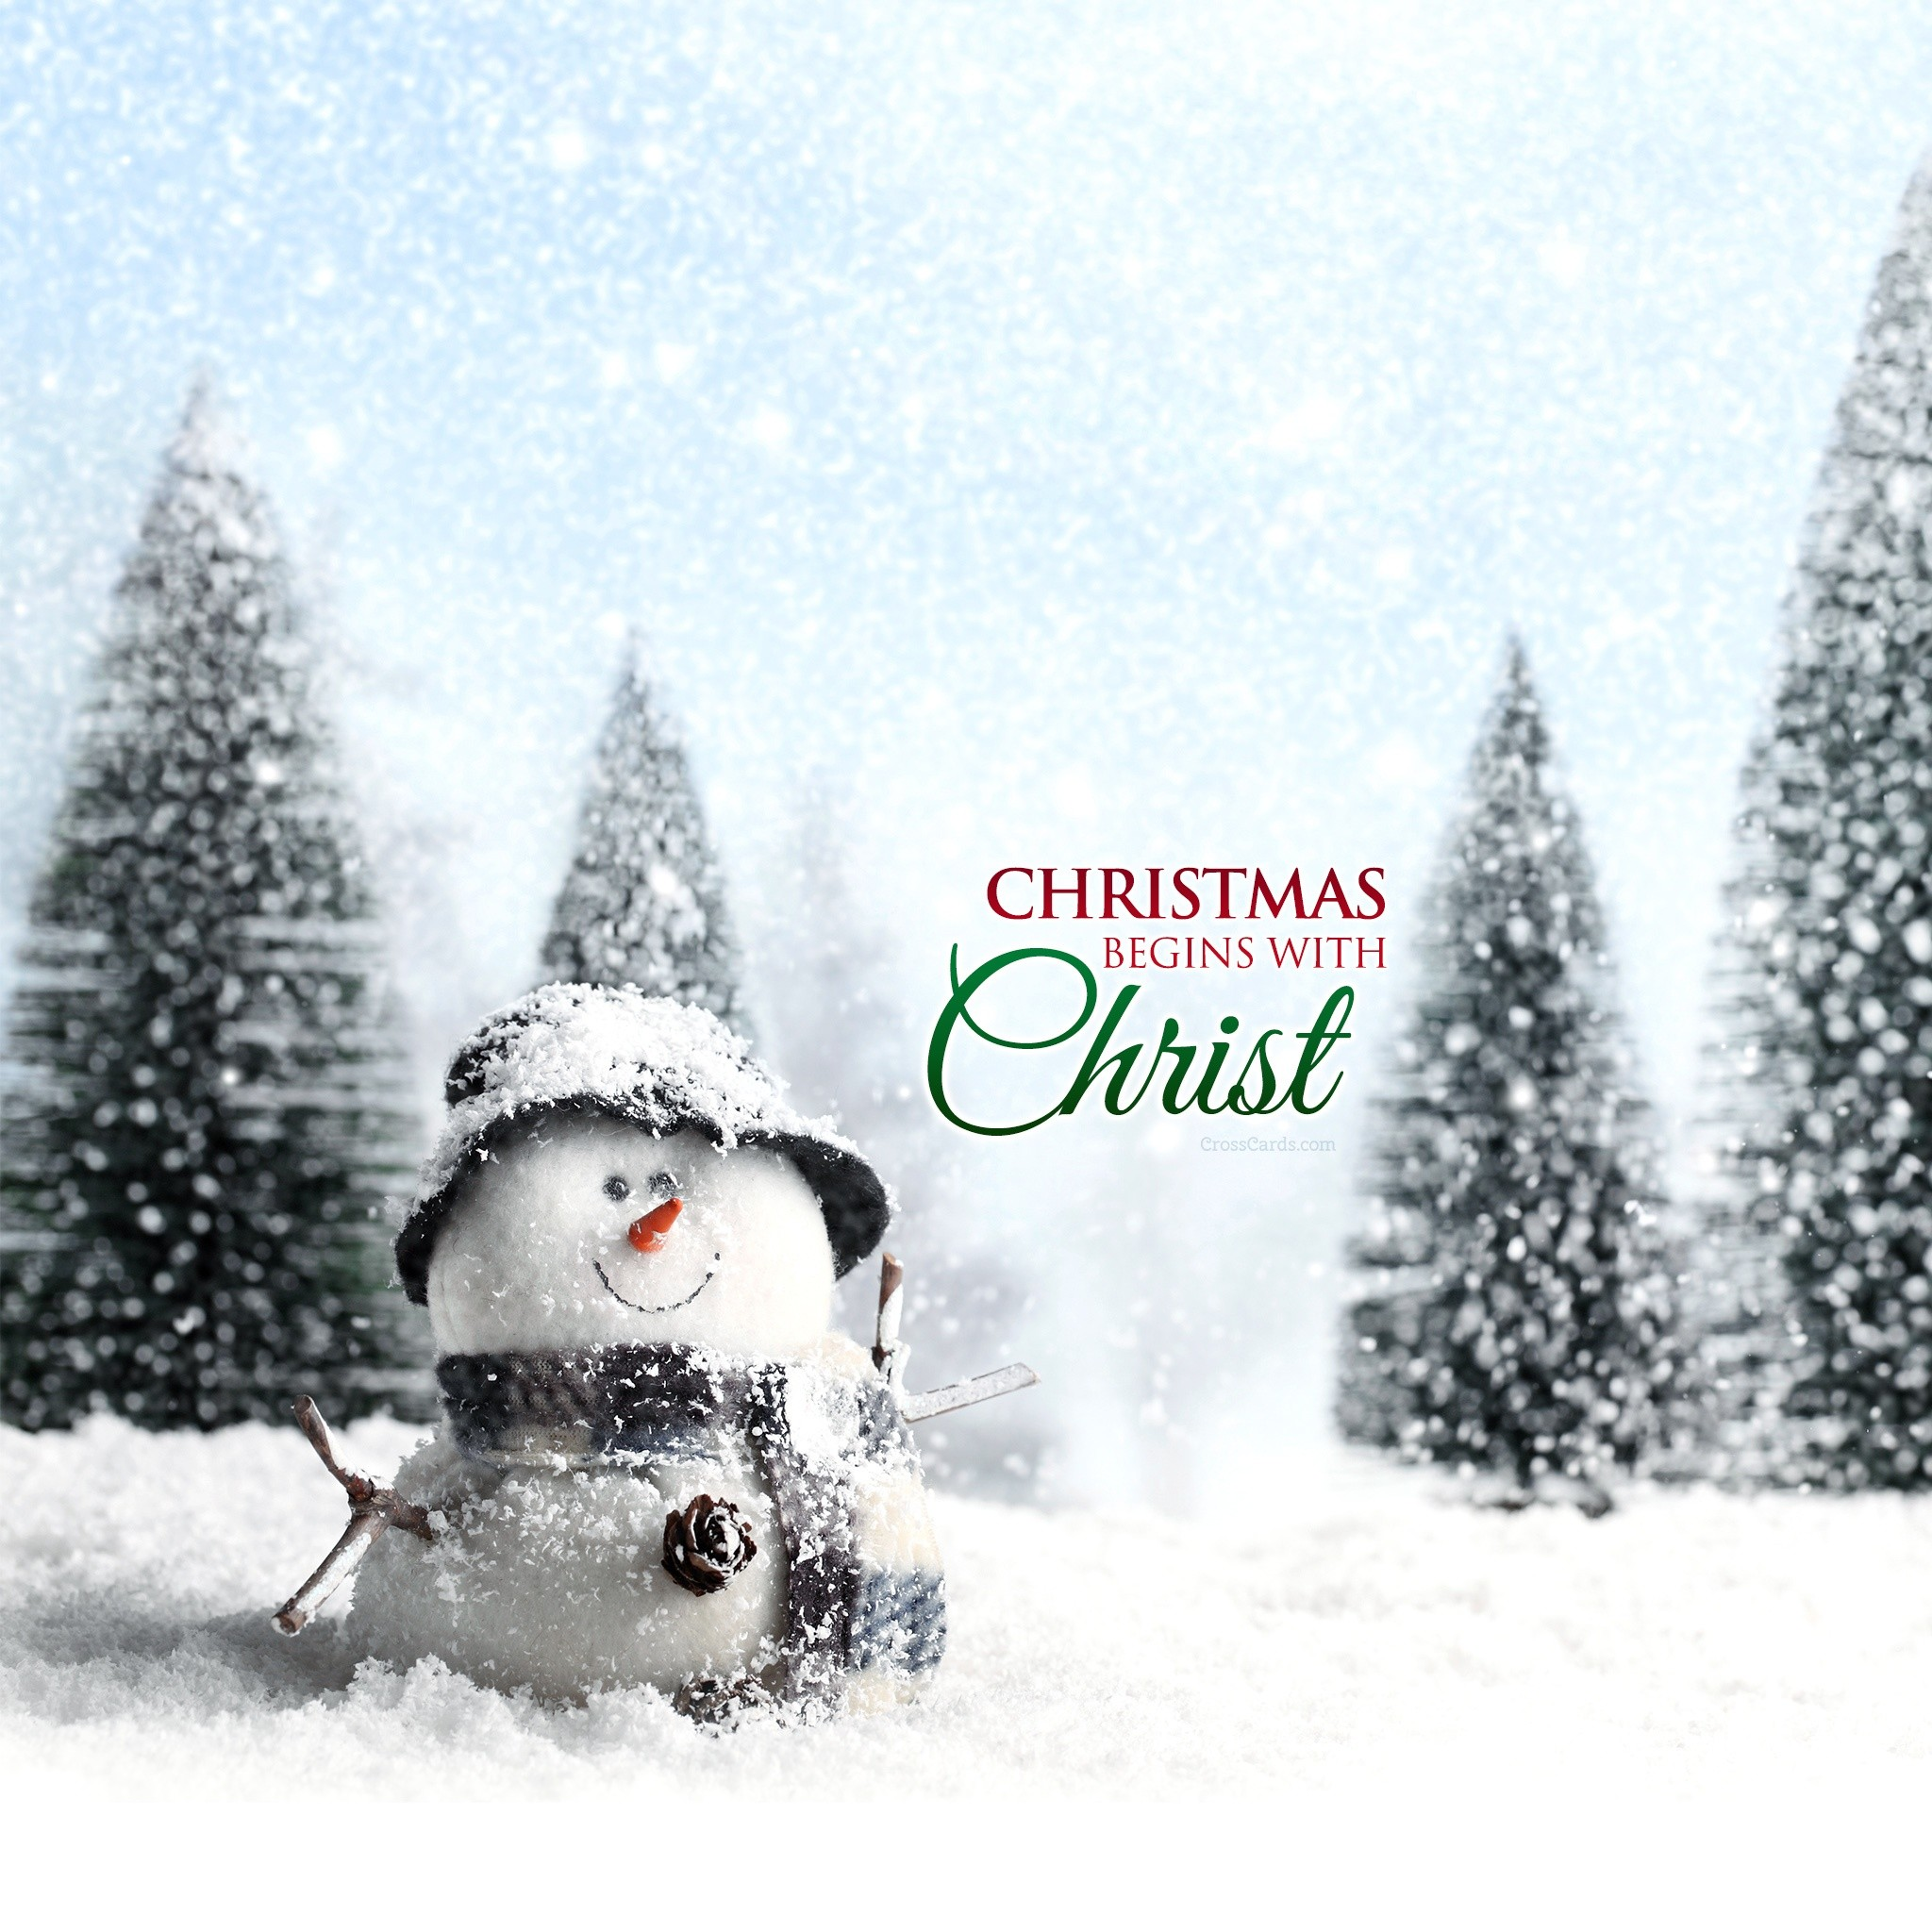 Christian Christmas Wallpaper (54+ Images